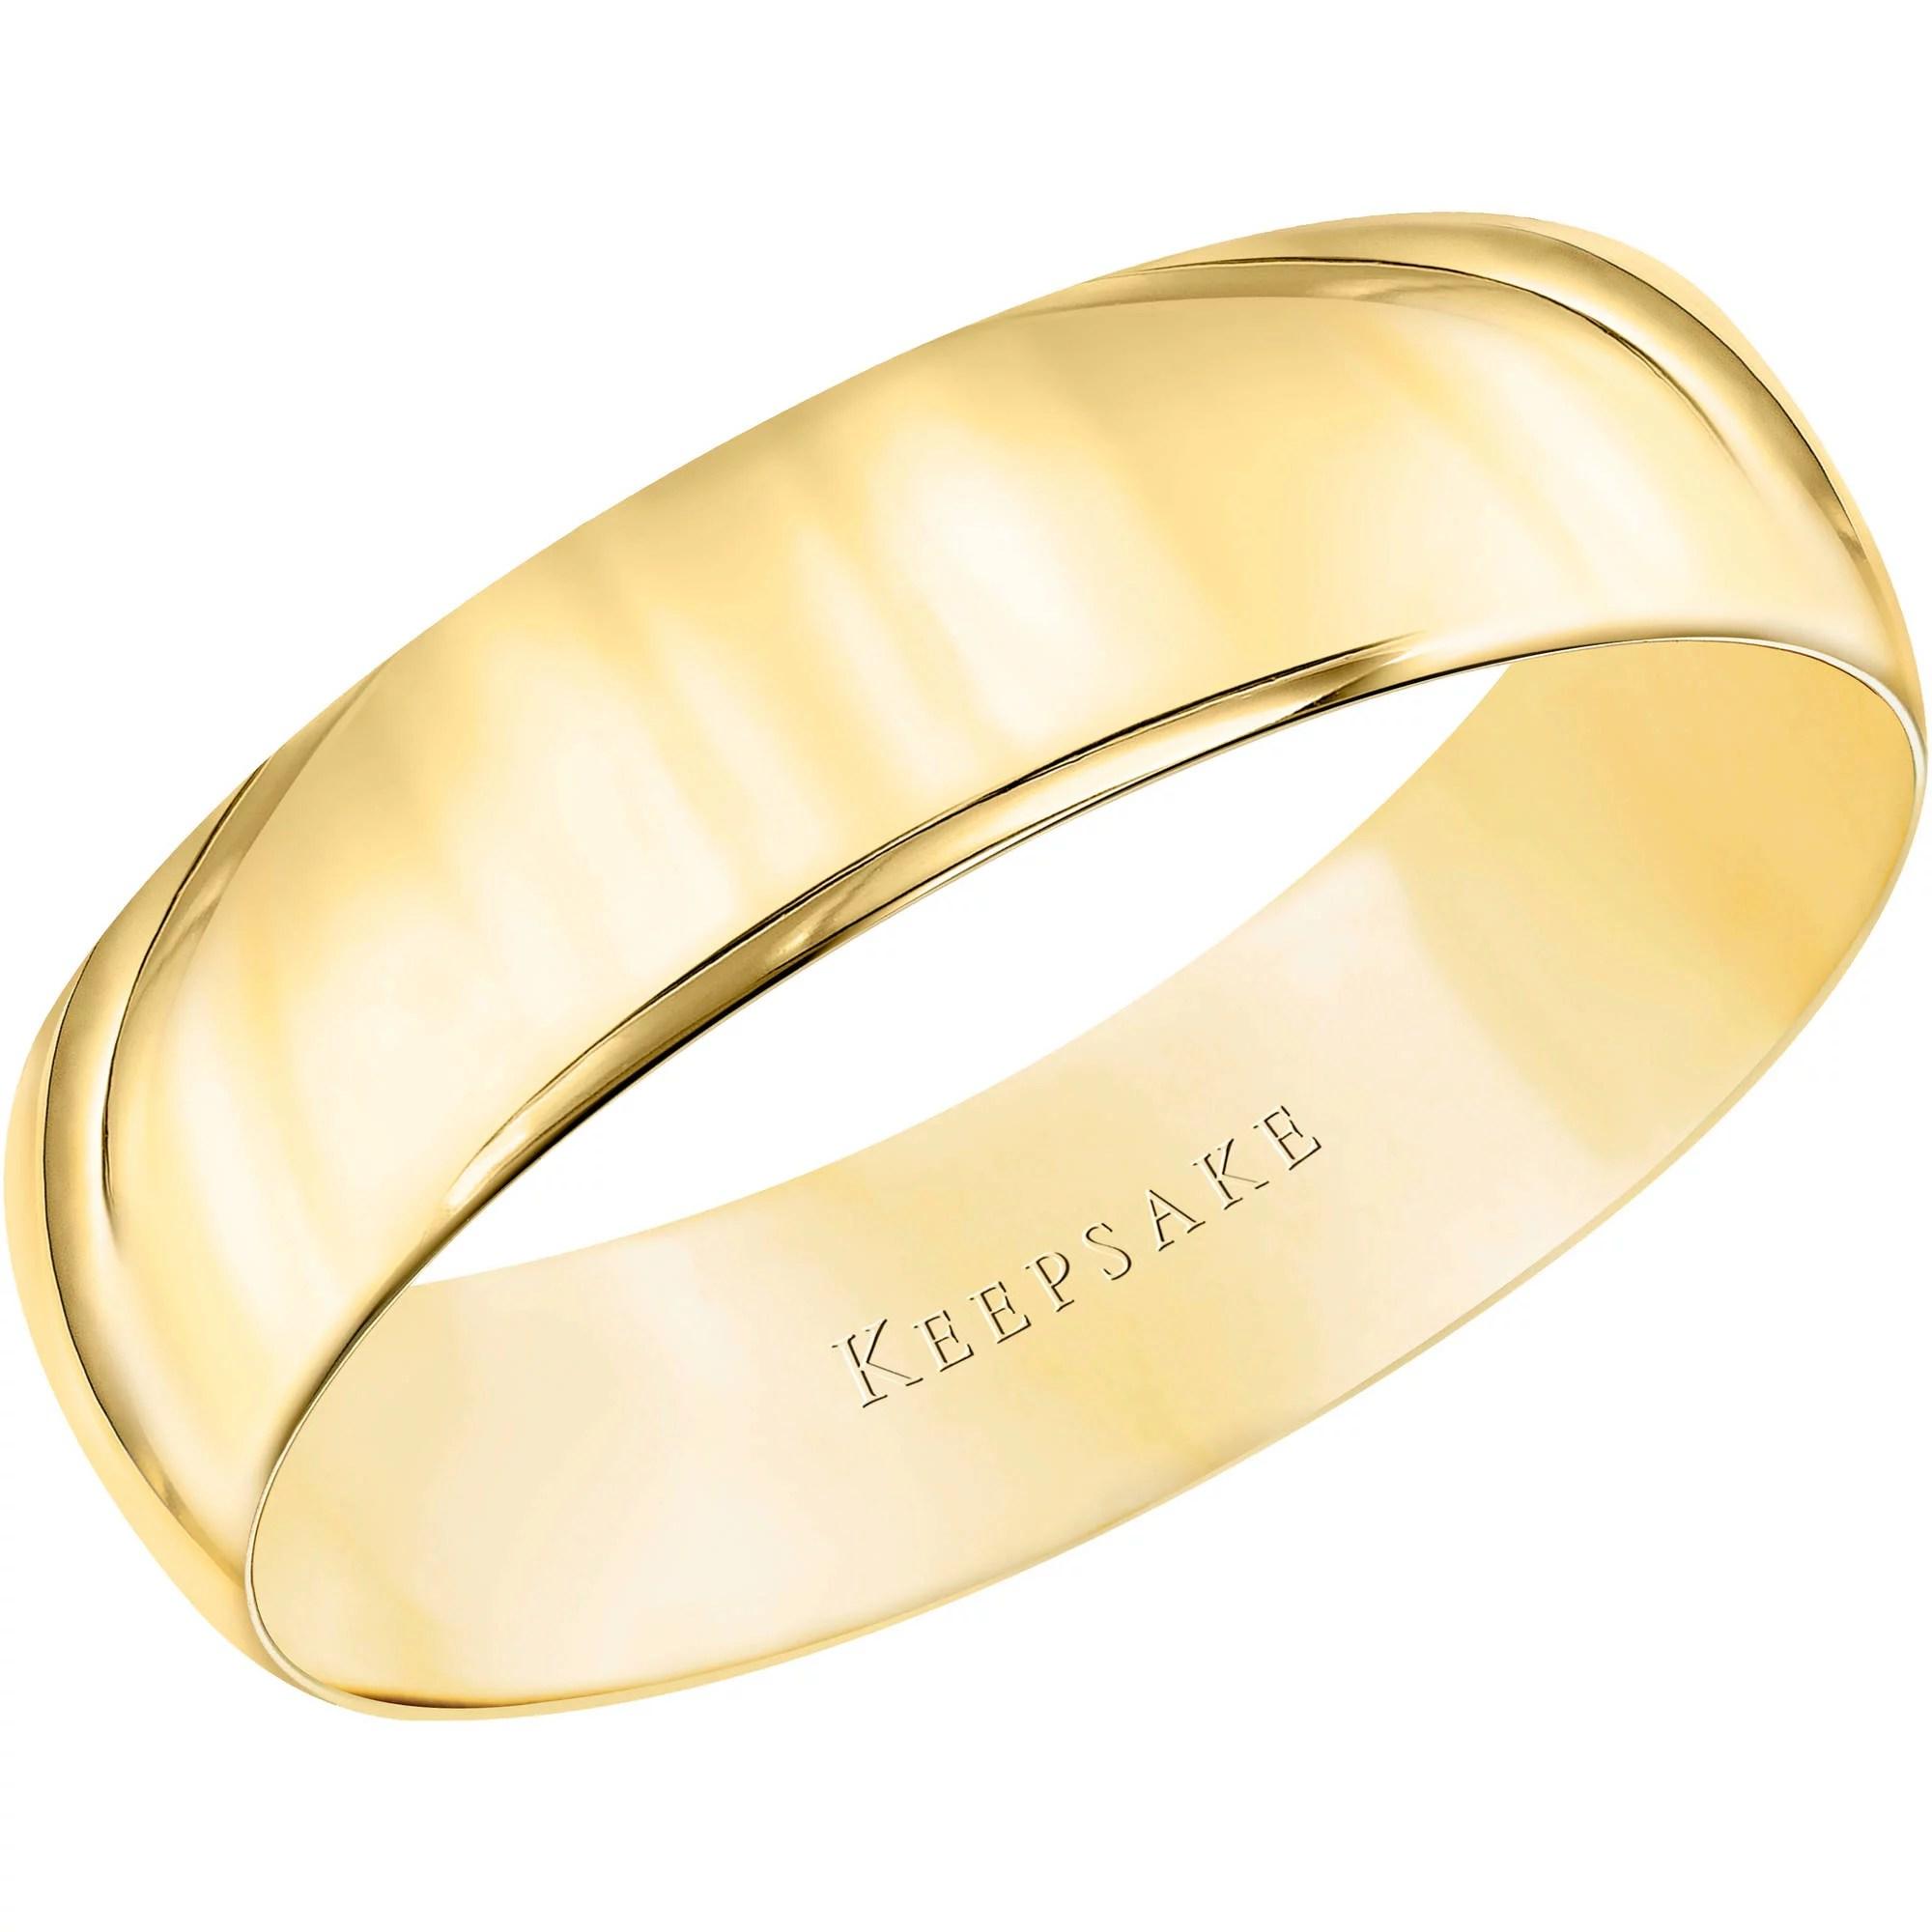 keepsake wedding rings Keepsake 10kt Yellow Gold Wedding Band With High Polish Finish 5mm